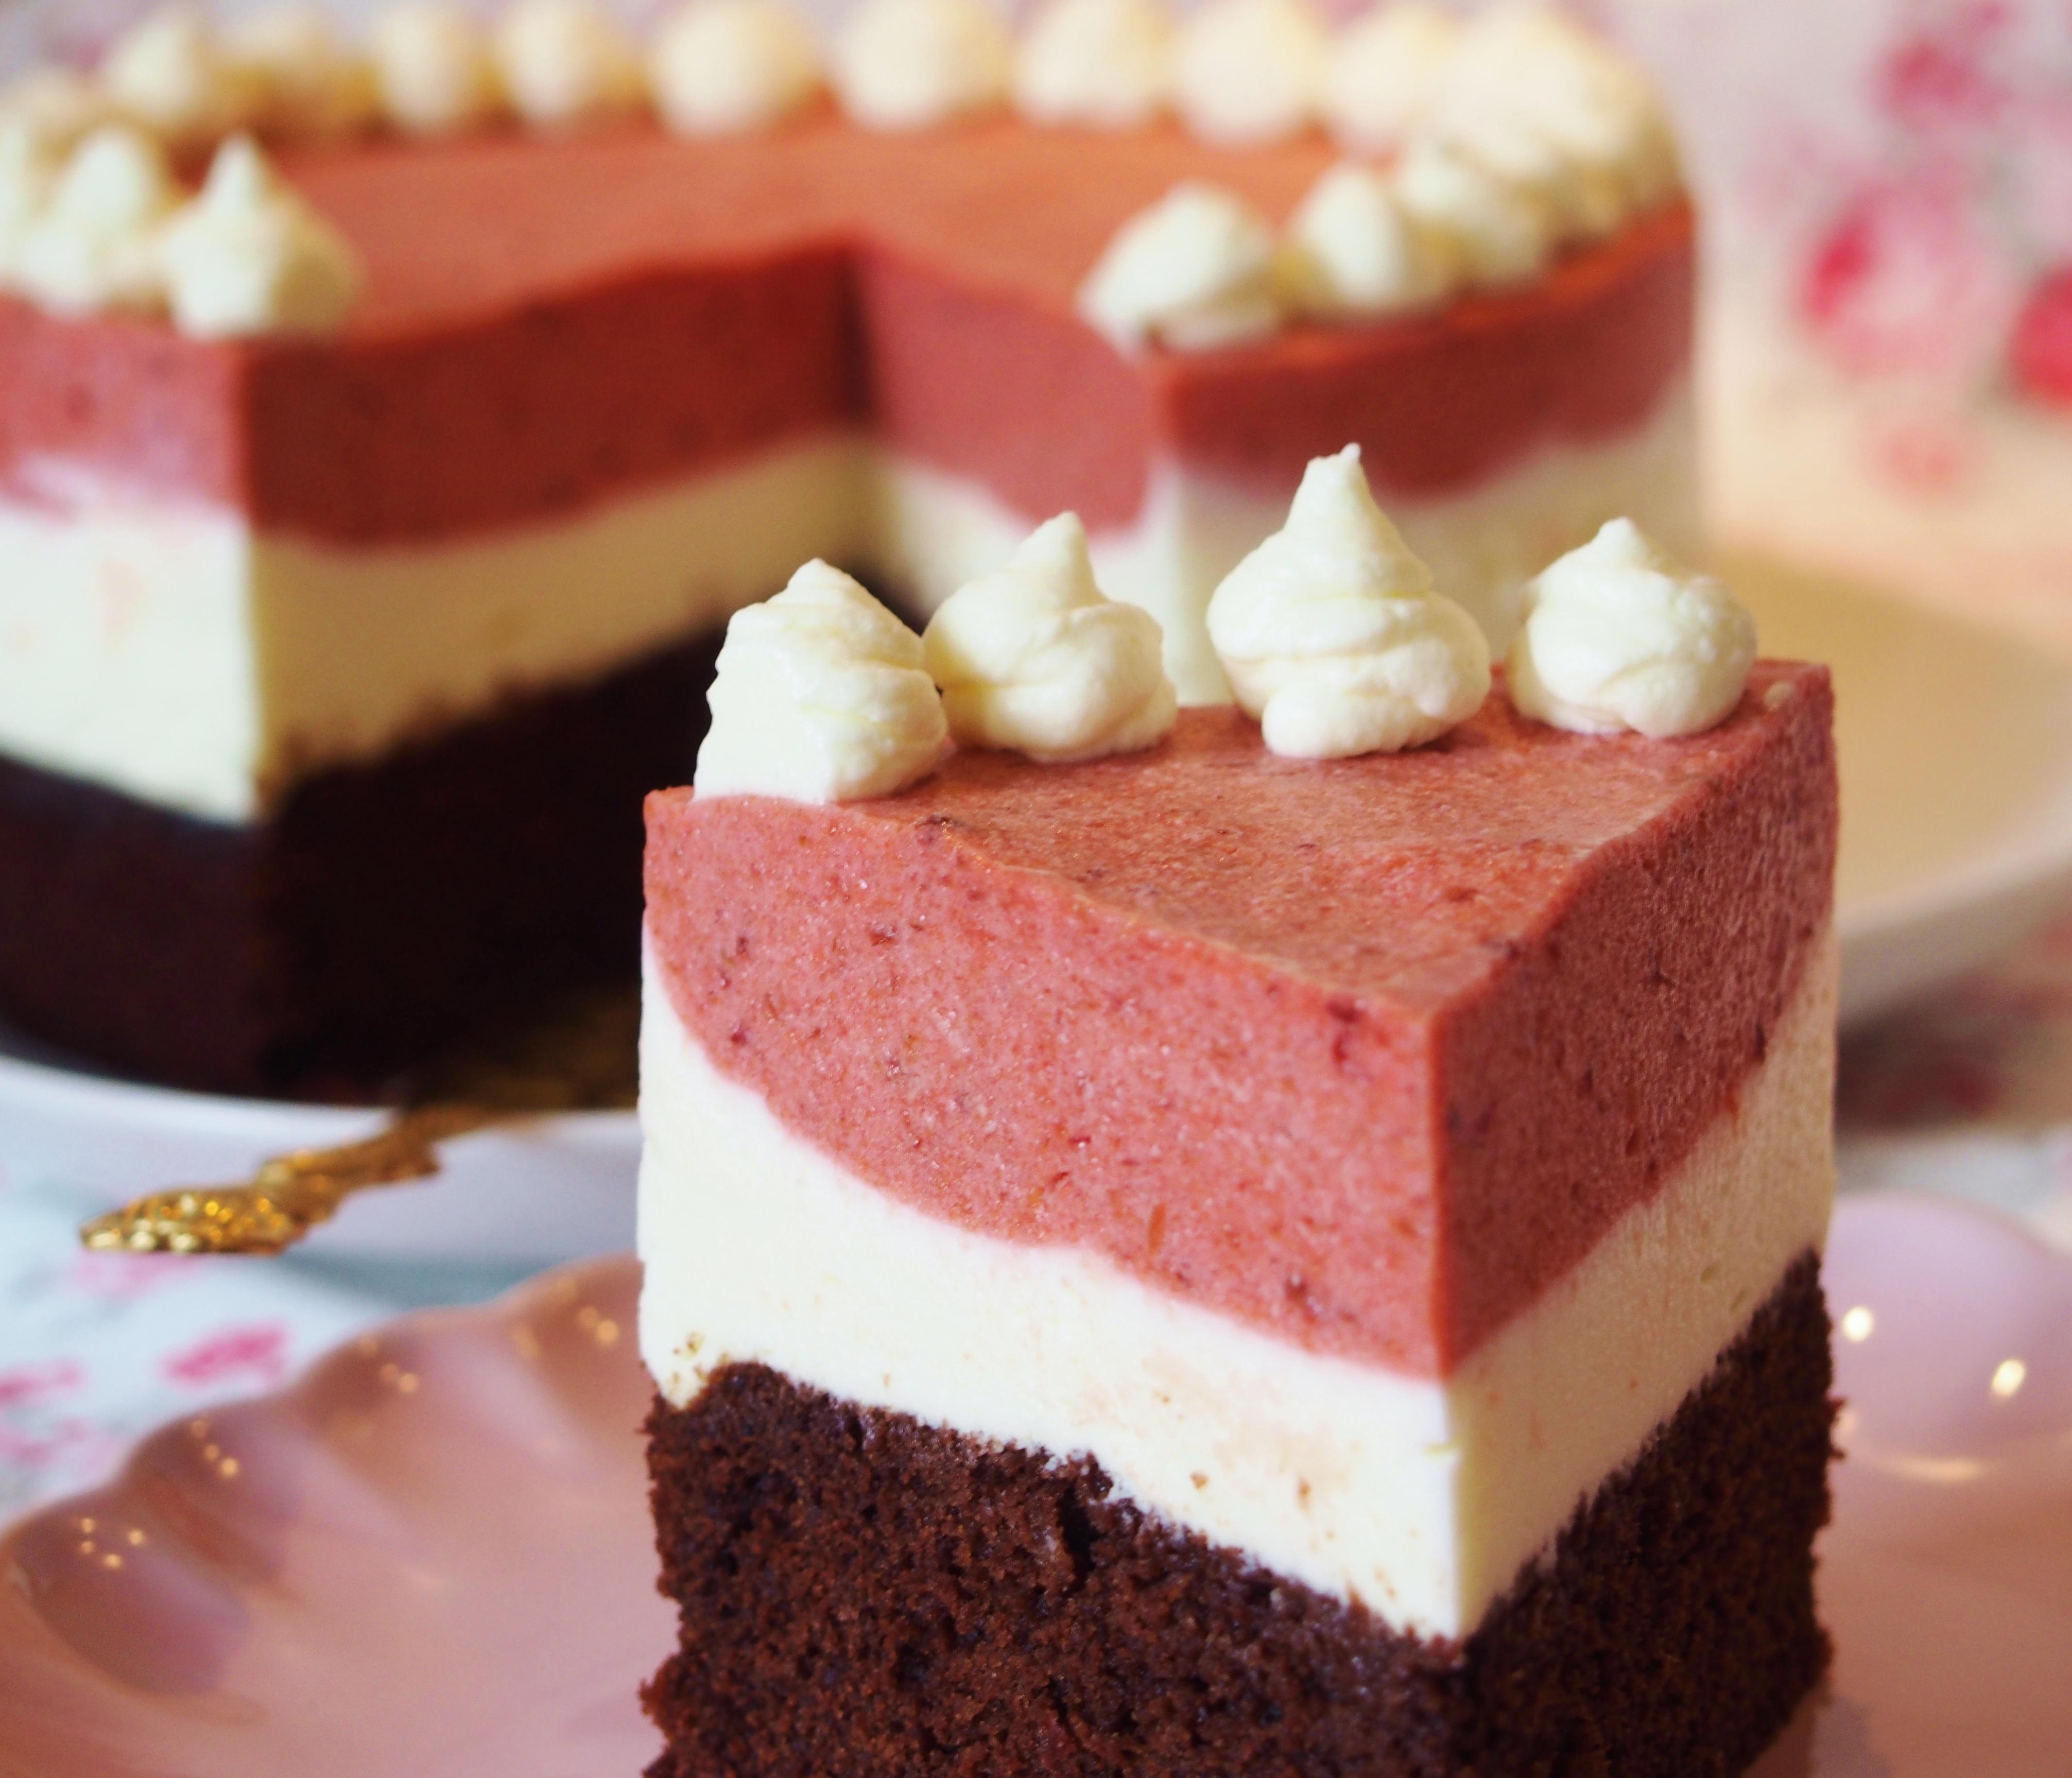 Schokolade Frulein Ella Seite 6 Red Velvet Nougat Cake 15cm Schoko Vanilletorte